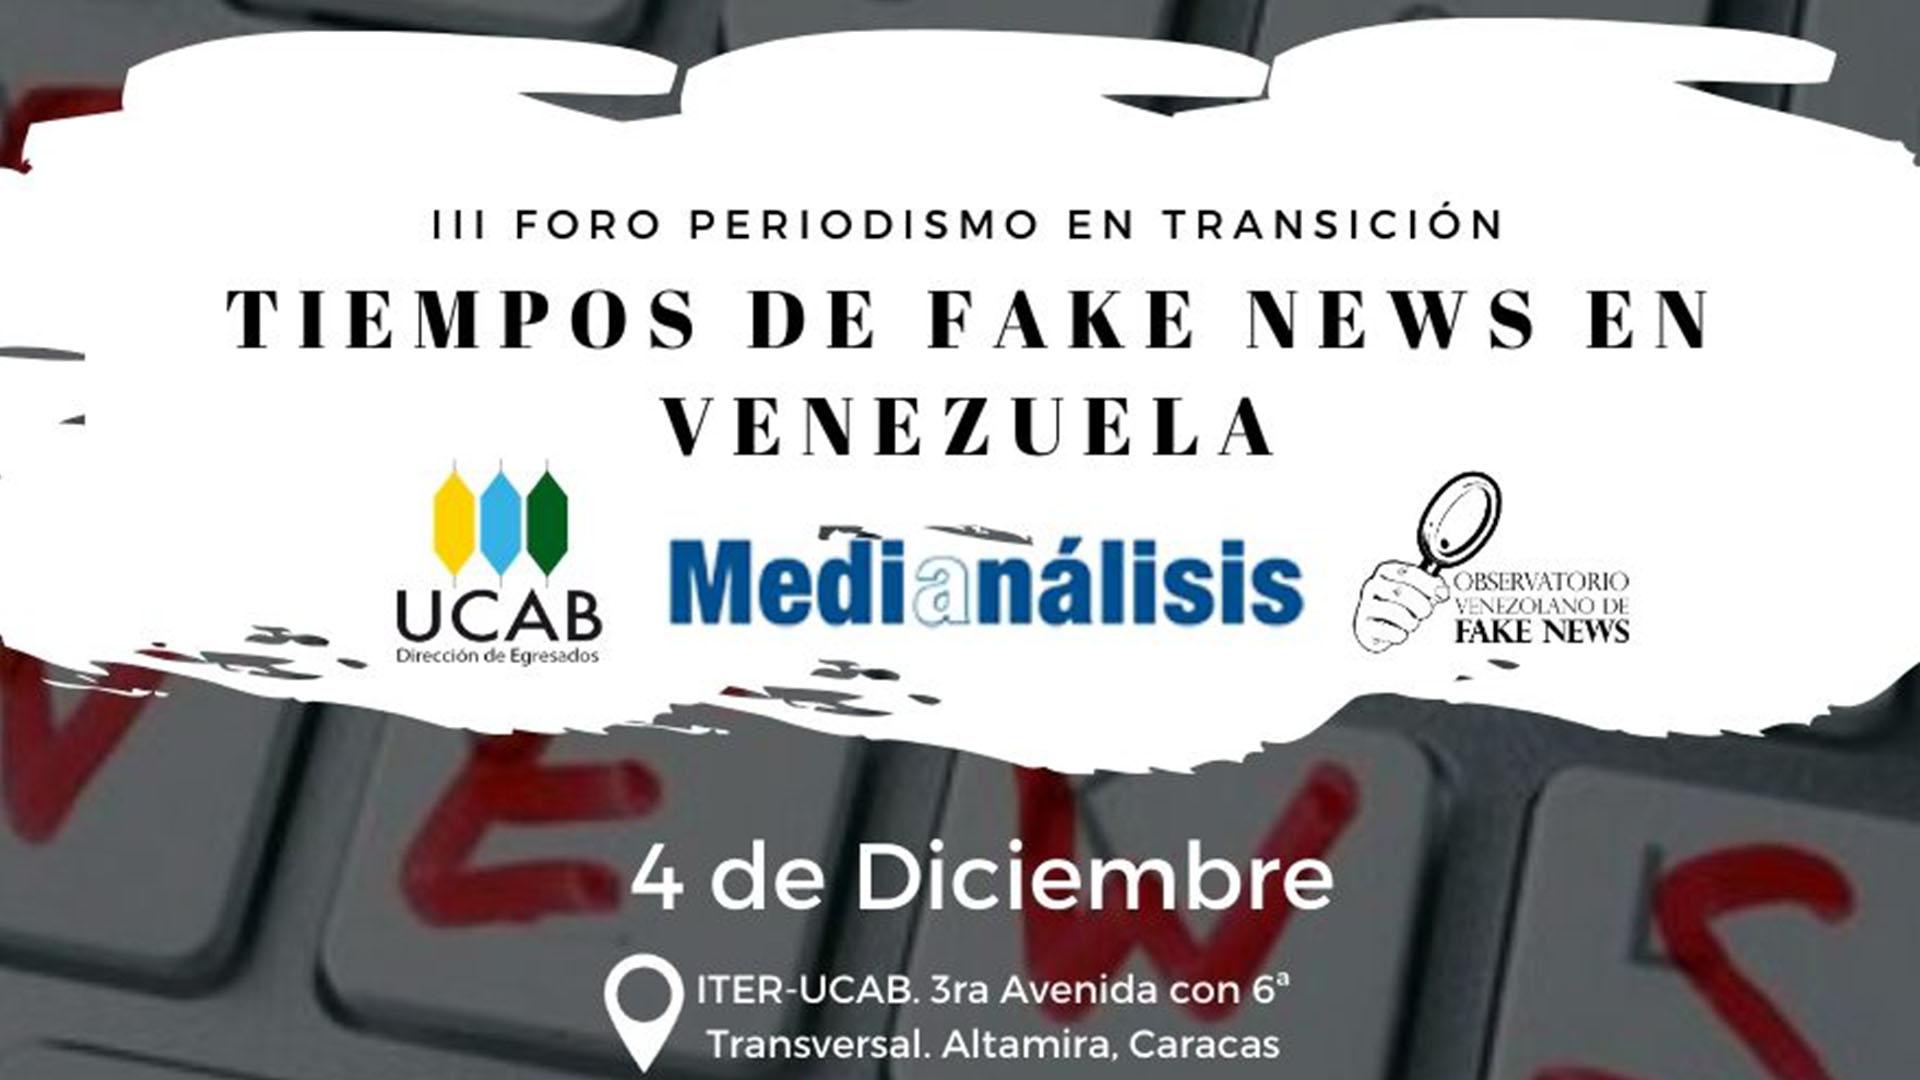 Observatorio Venezolano de Fake News ofrecerá antídoto anti falsedades el próximo 4-D